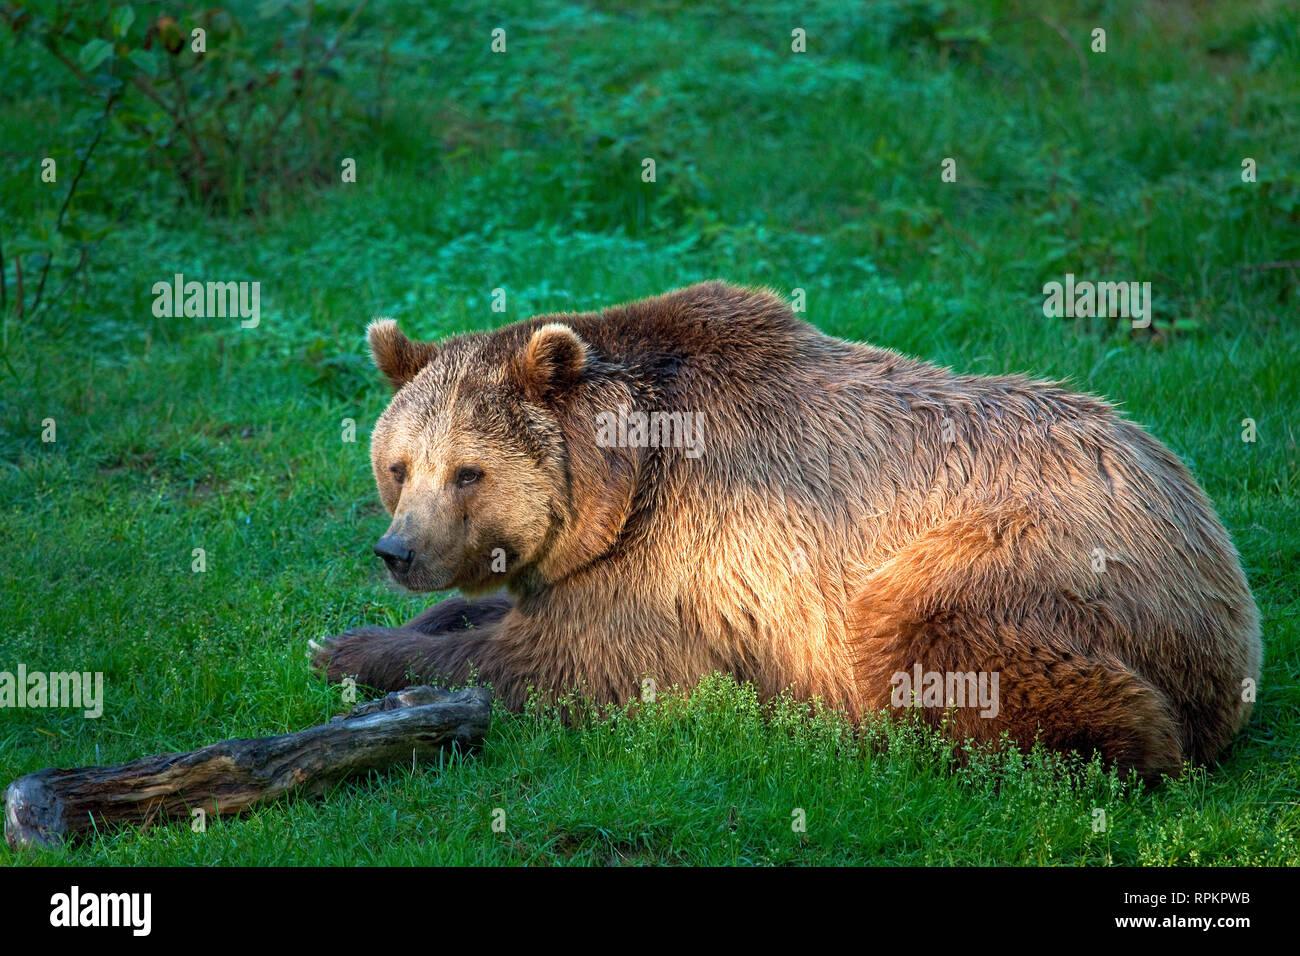 zoology / animals, mammal / mammalian, bear, European brown bear (Ursus arctos), Neuschoenau, National, Additional-Rights-Clearance-Info-Not-Available Stock Photo